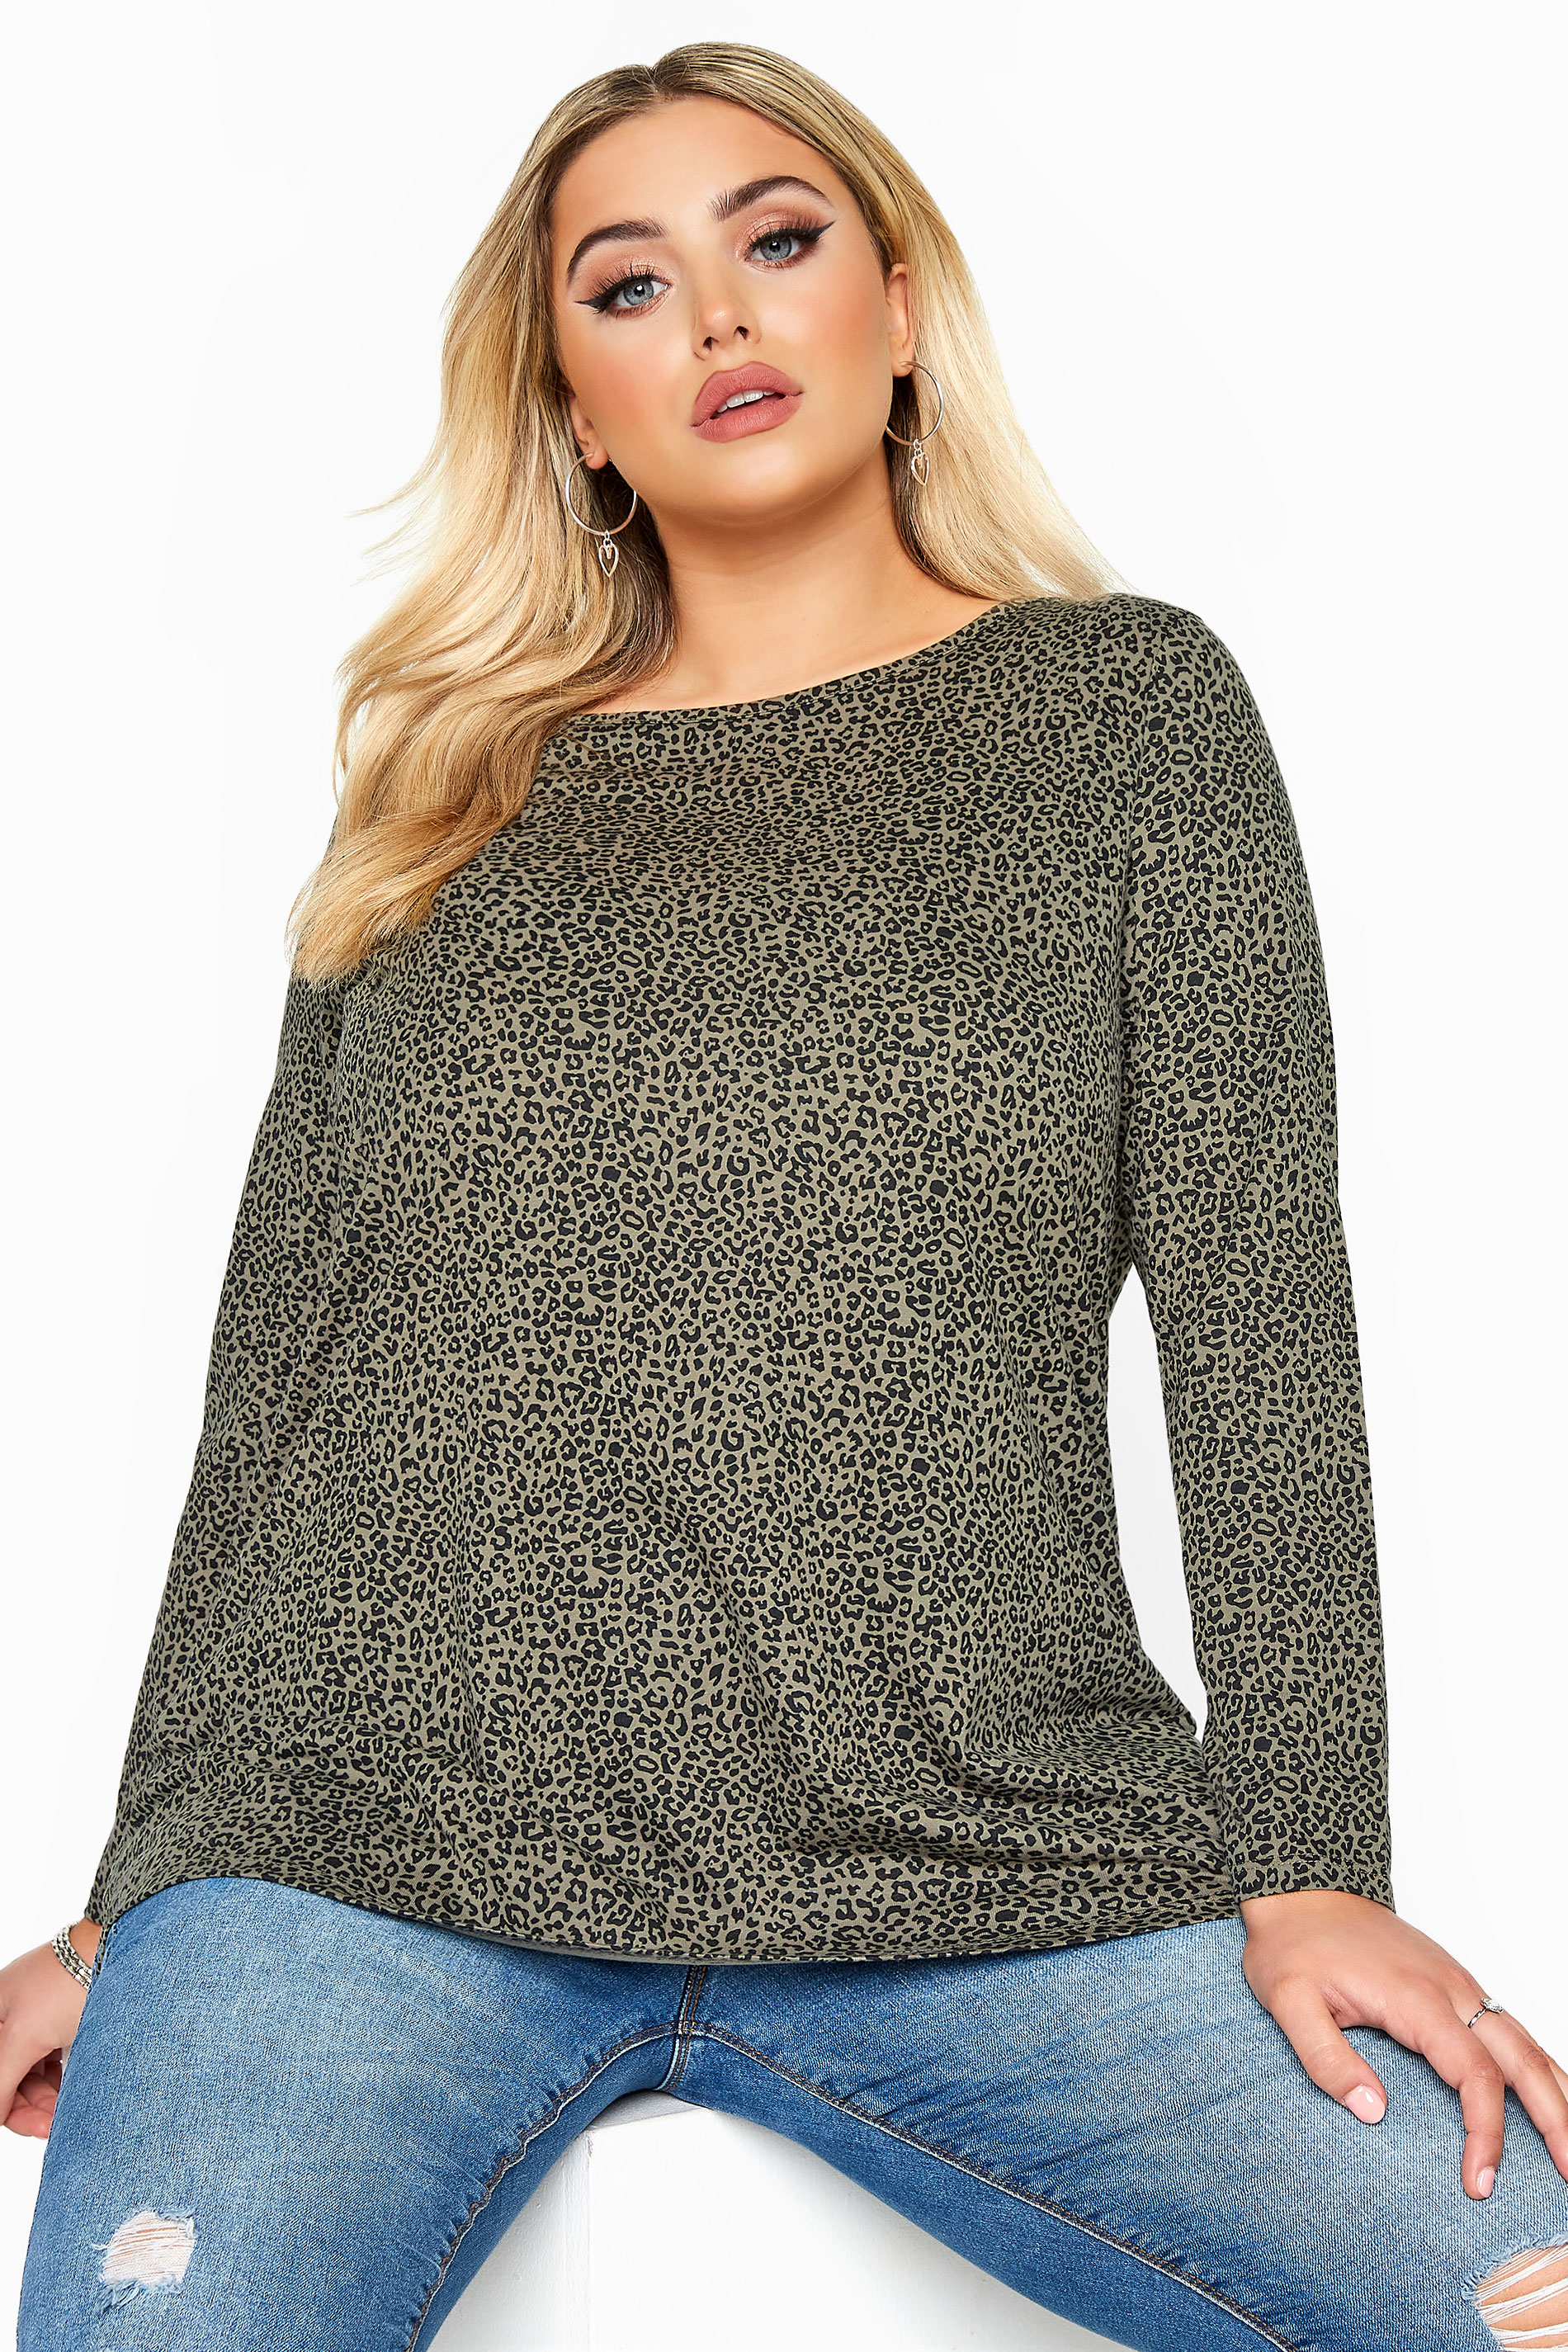 Khaki Animal Print Long Sleeve Top